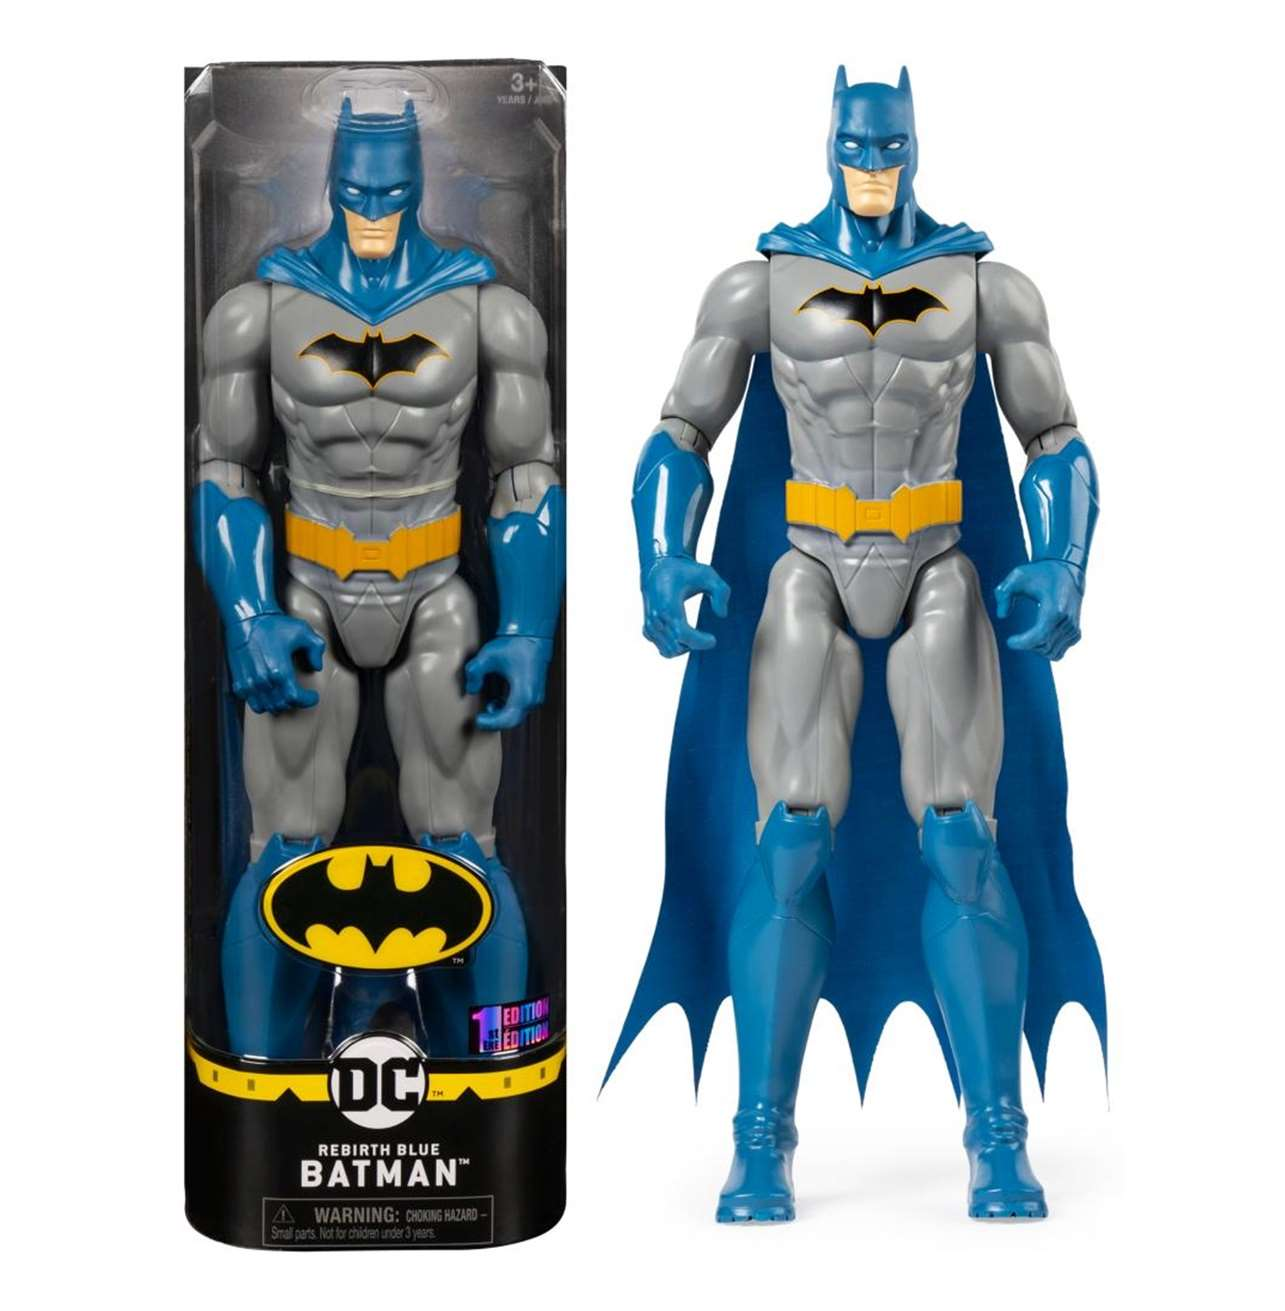 Batman Rebirth Blue Figura The Caped Crusader Spin Master